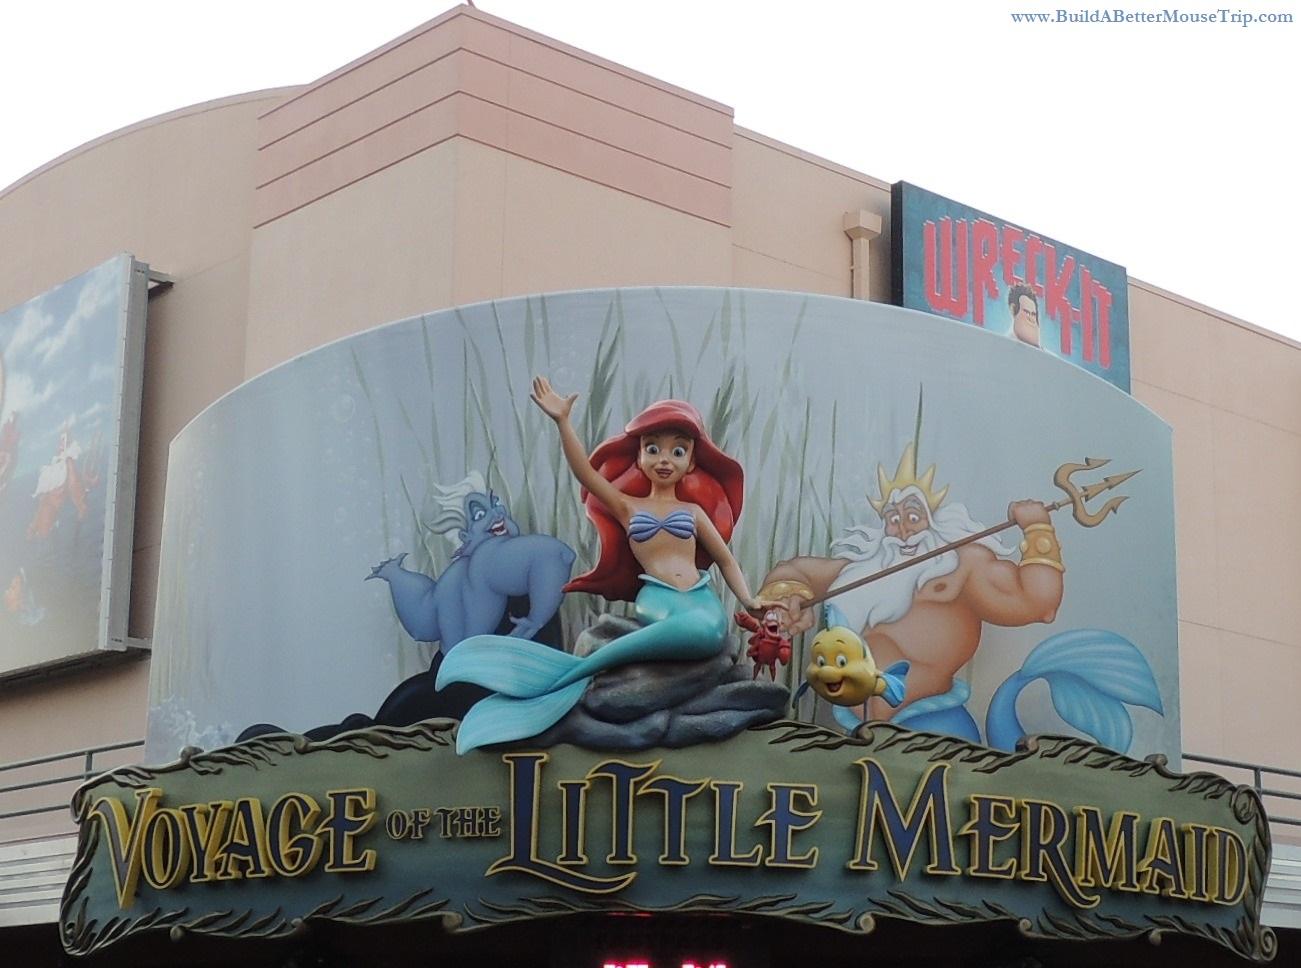 Voyage of the Little Mermaid at Disney's Hollywood Studios / Walt Disney World Resort